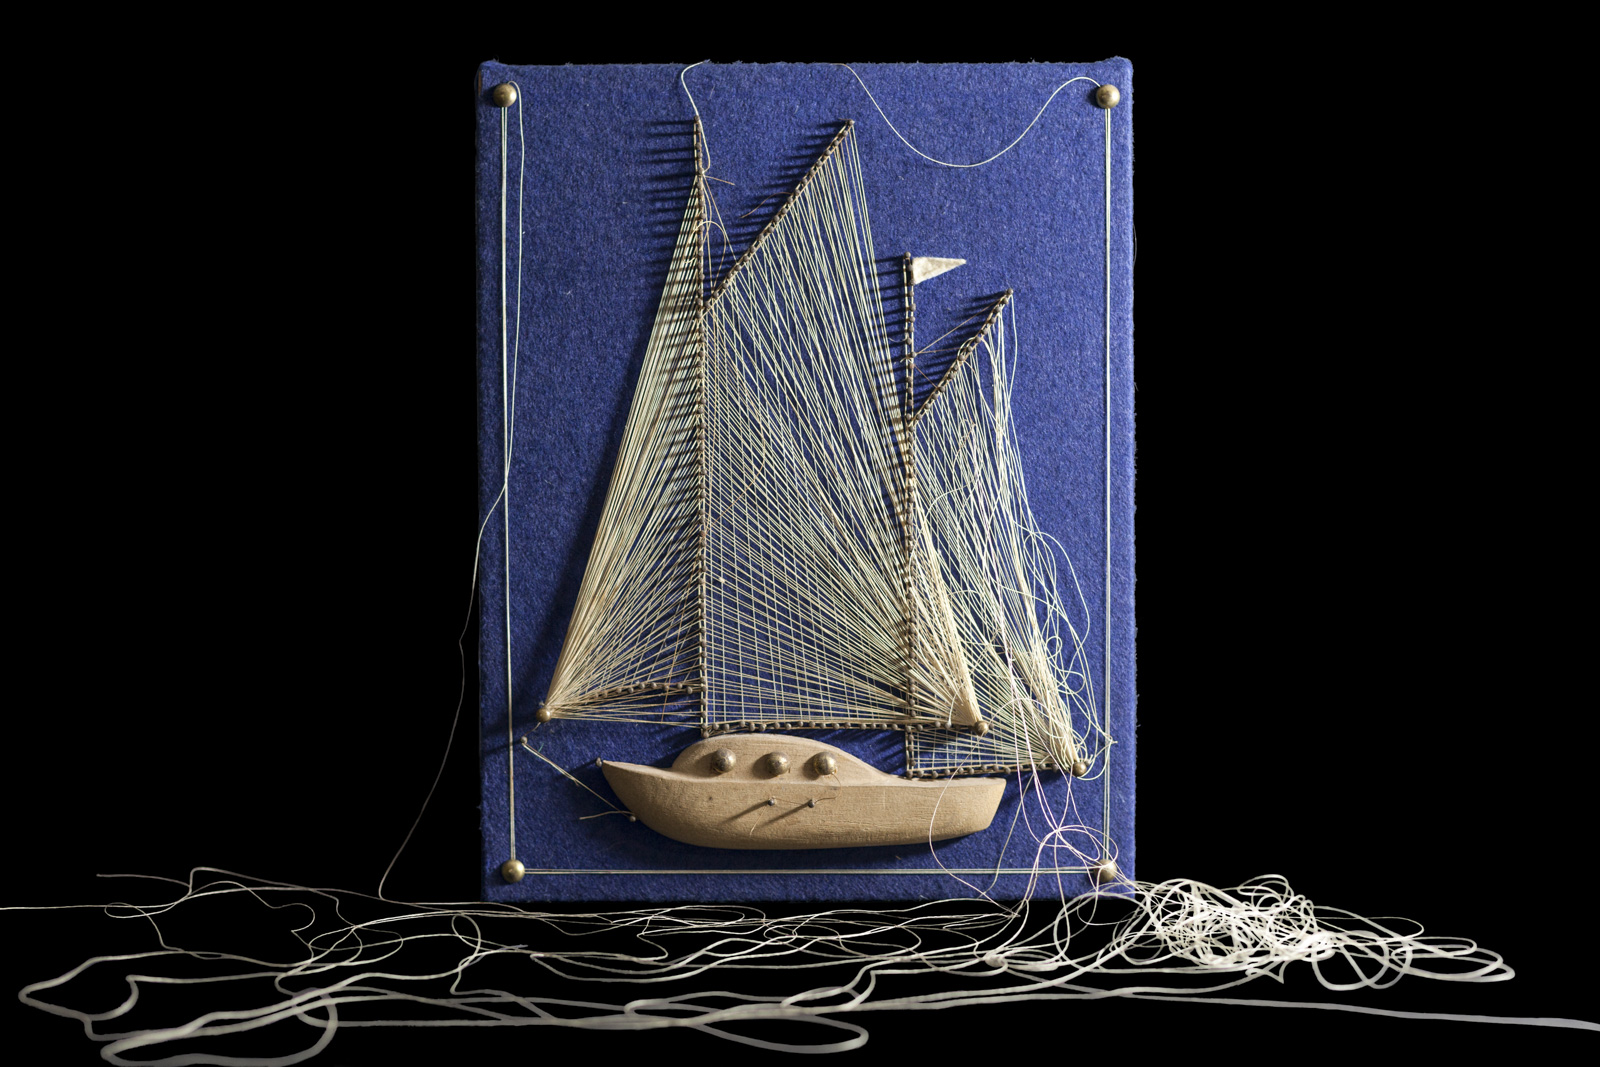 Adrift © Jane Szabo